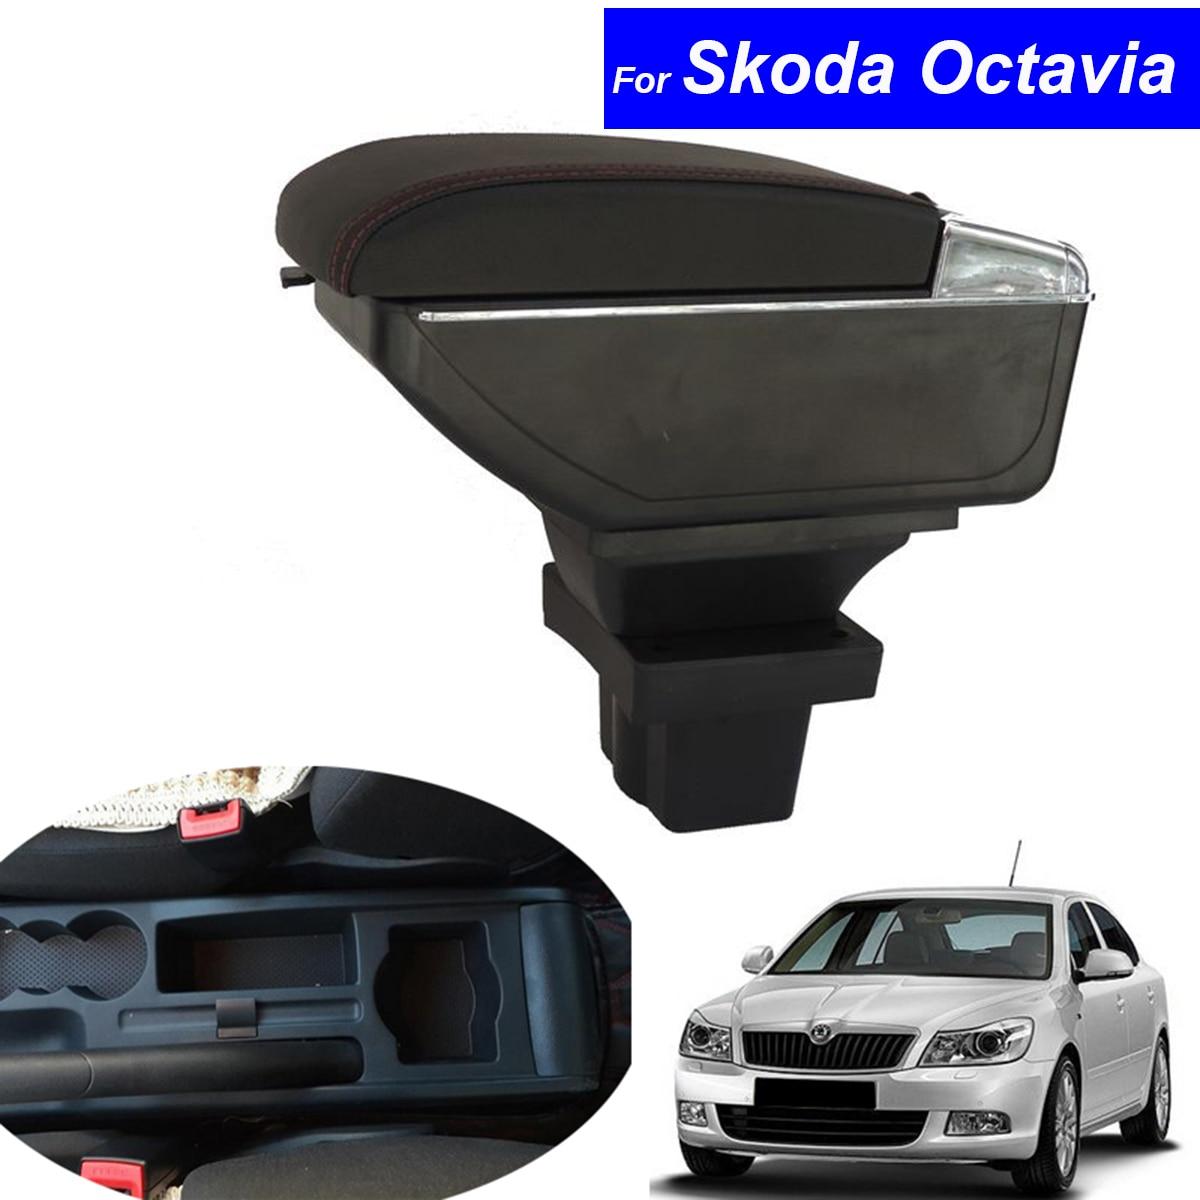 For Skoda Octavia 2009 2010 2011 2012 2013 2014 2015 2016 Armrest with USB Leather Car Center Console Armrests Storage Box